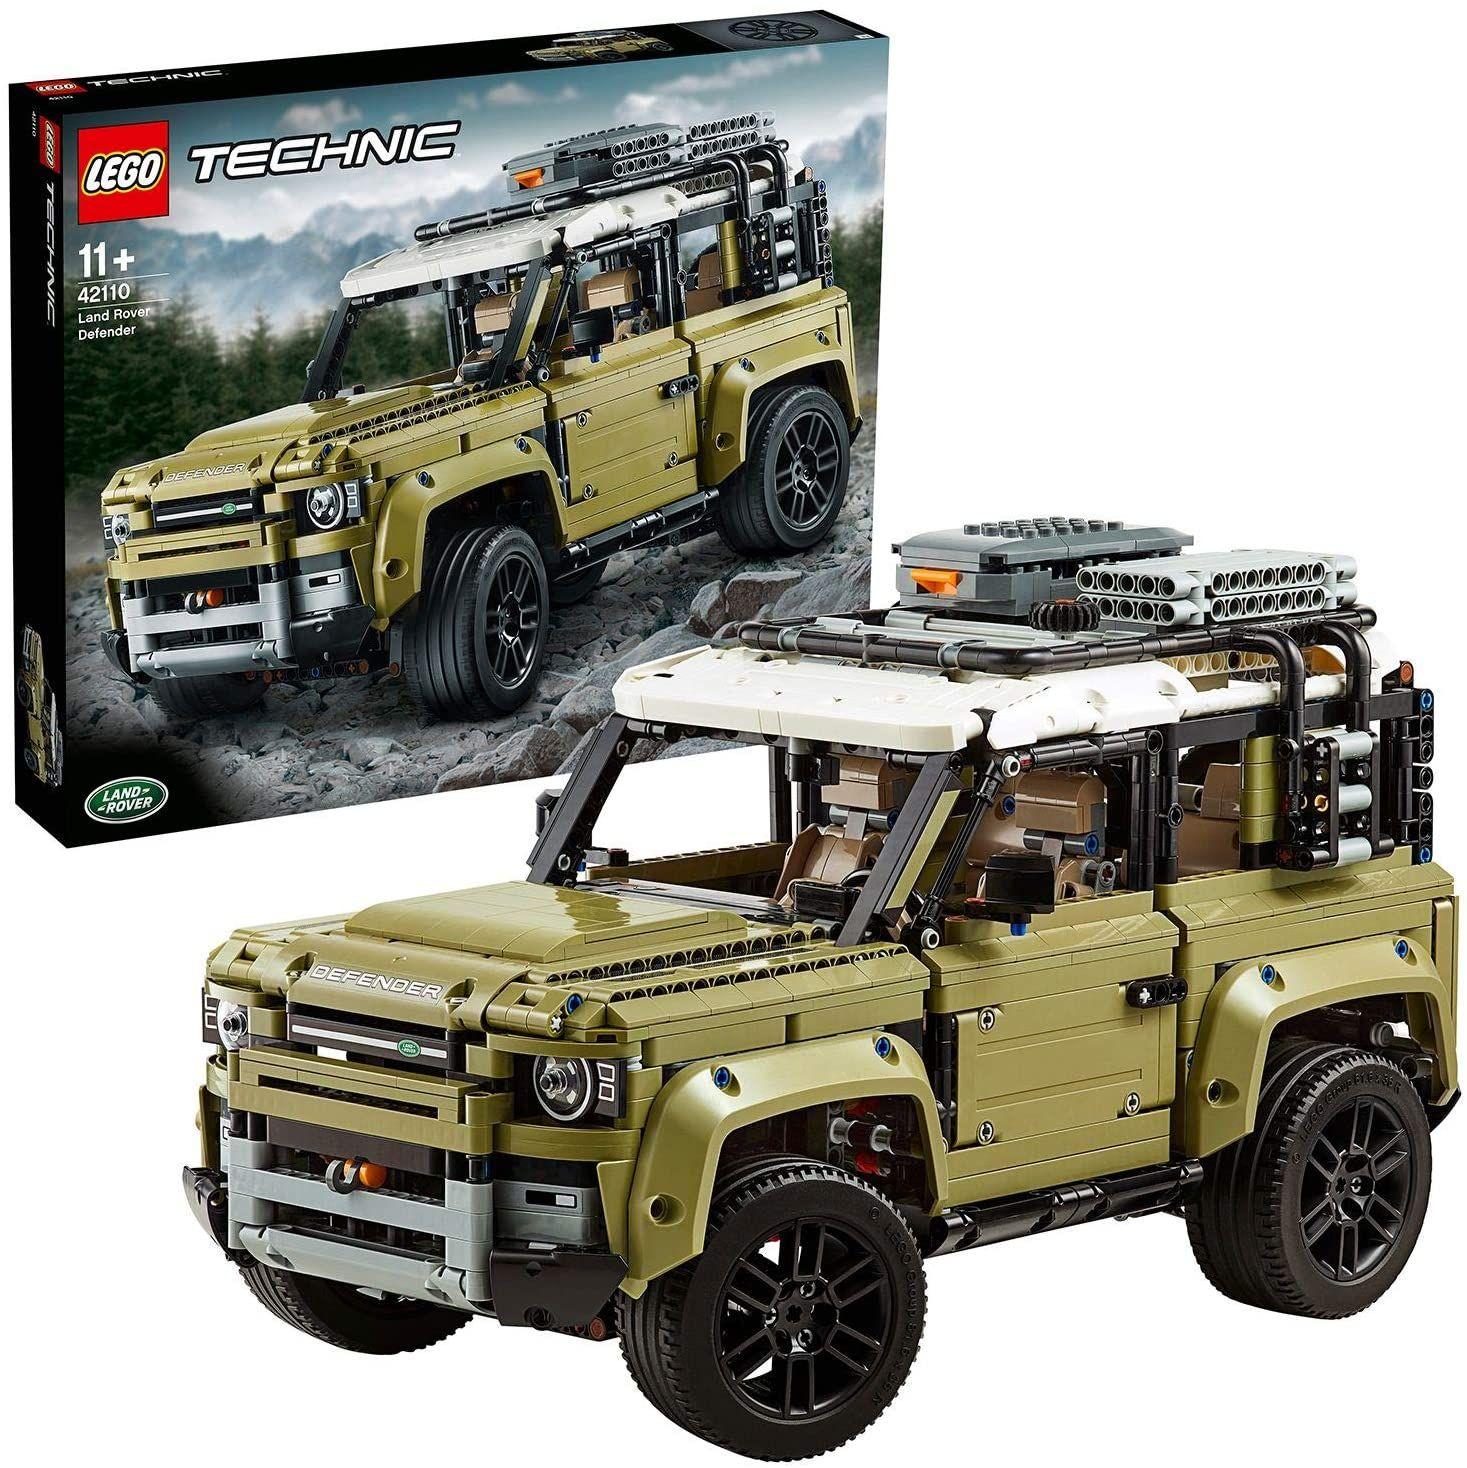 LEGO Technic (42110) Land Rover Defender - 2.573 Teile